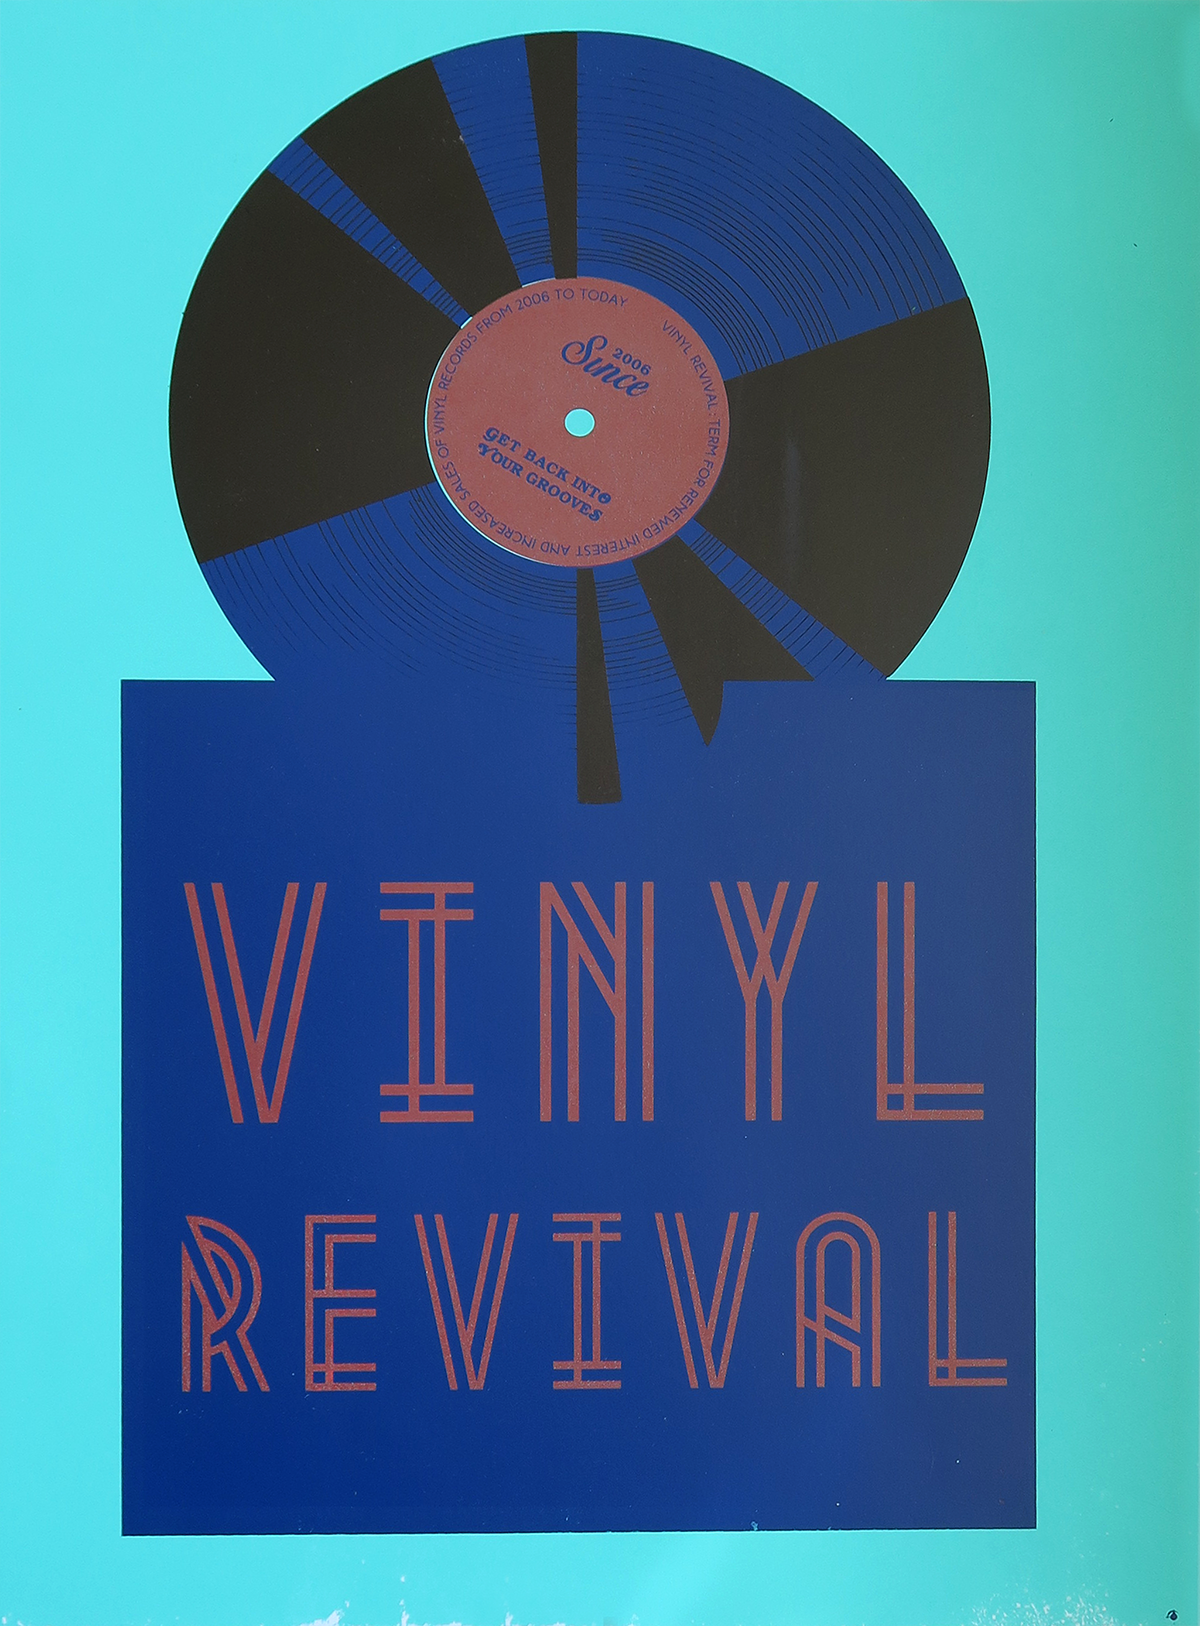 emalis-robateau_vinyl-revival_s14.png